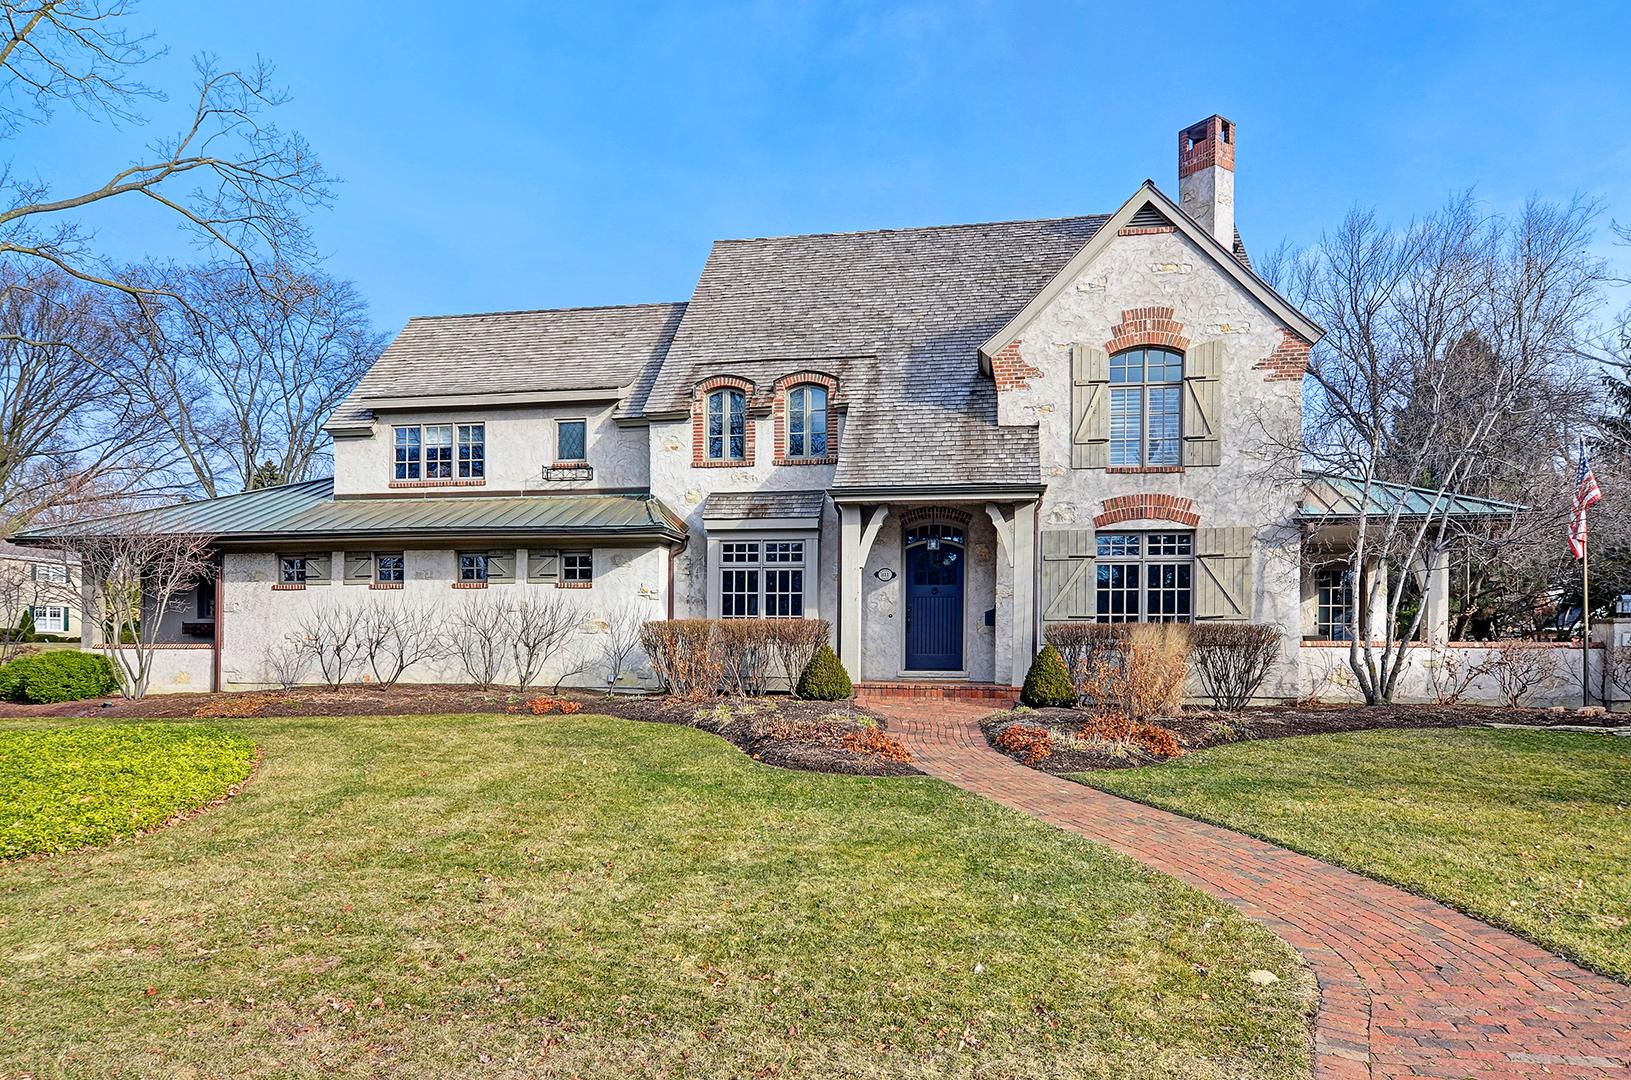 811 West Hickory Street, Hinsdale, Illinois 60521